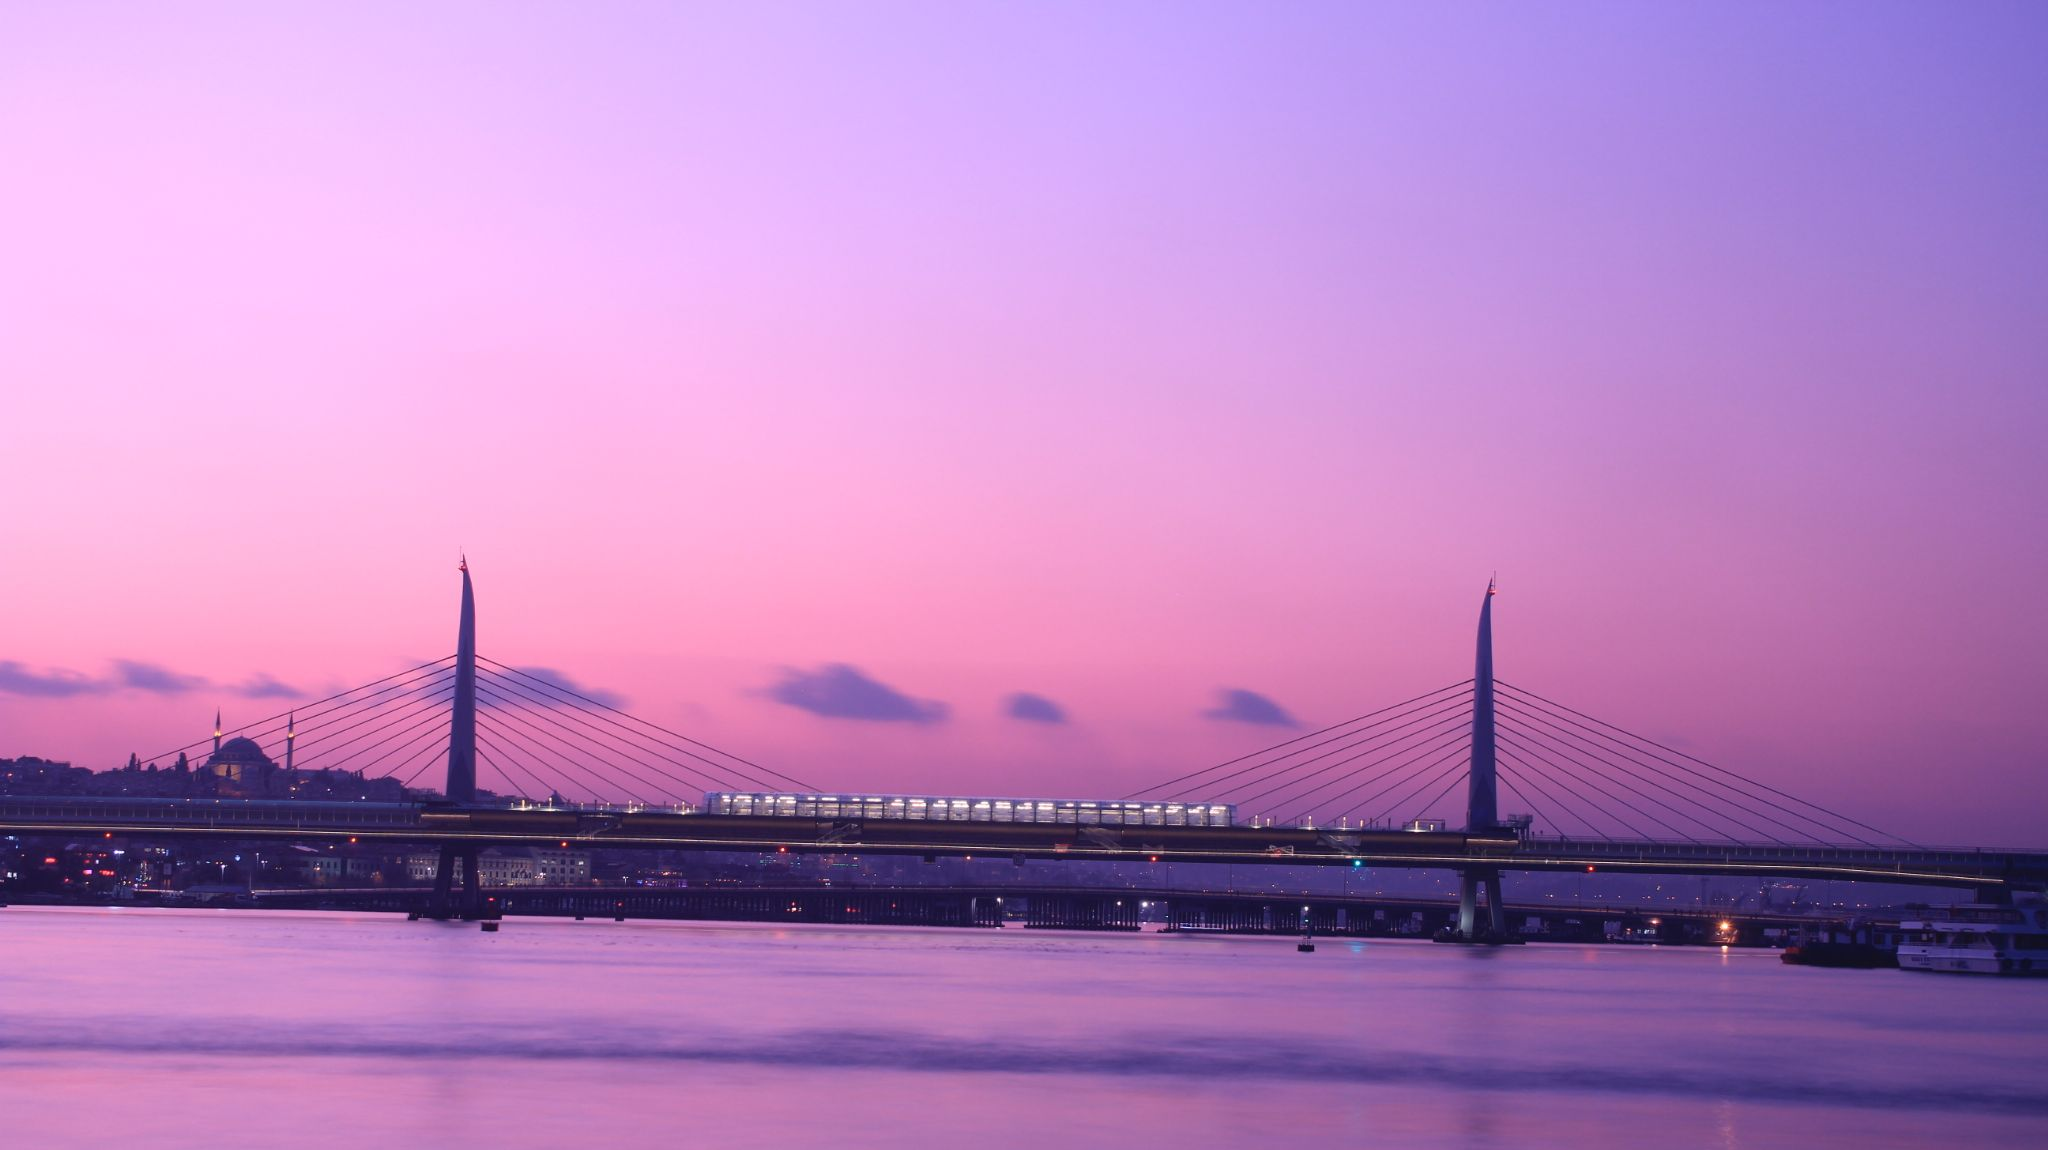 Haliç Metro Bridge by Ali Kemal Özer